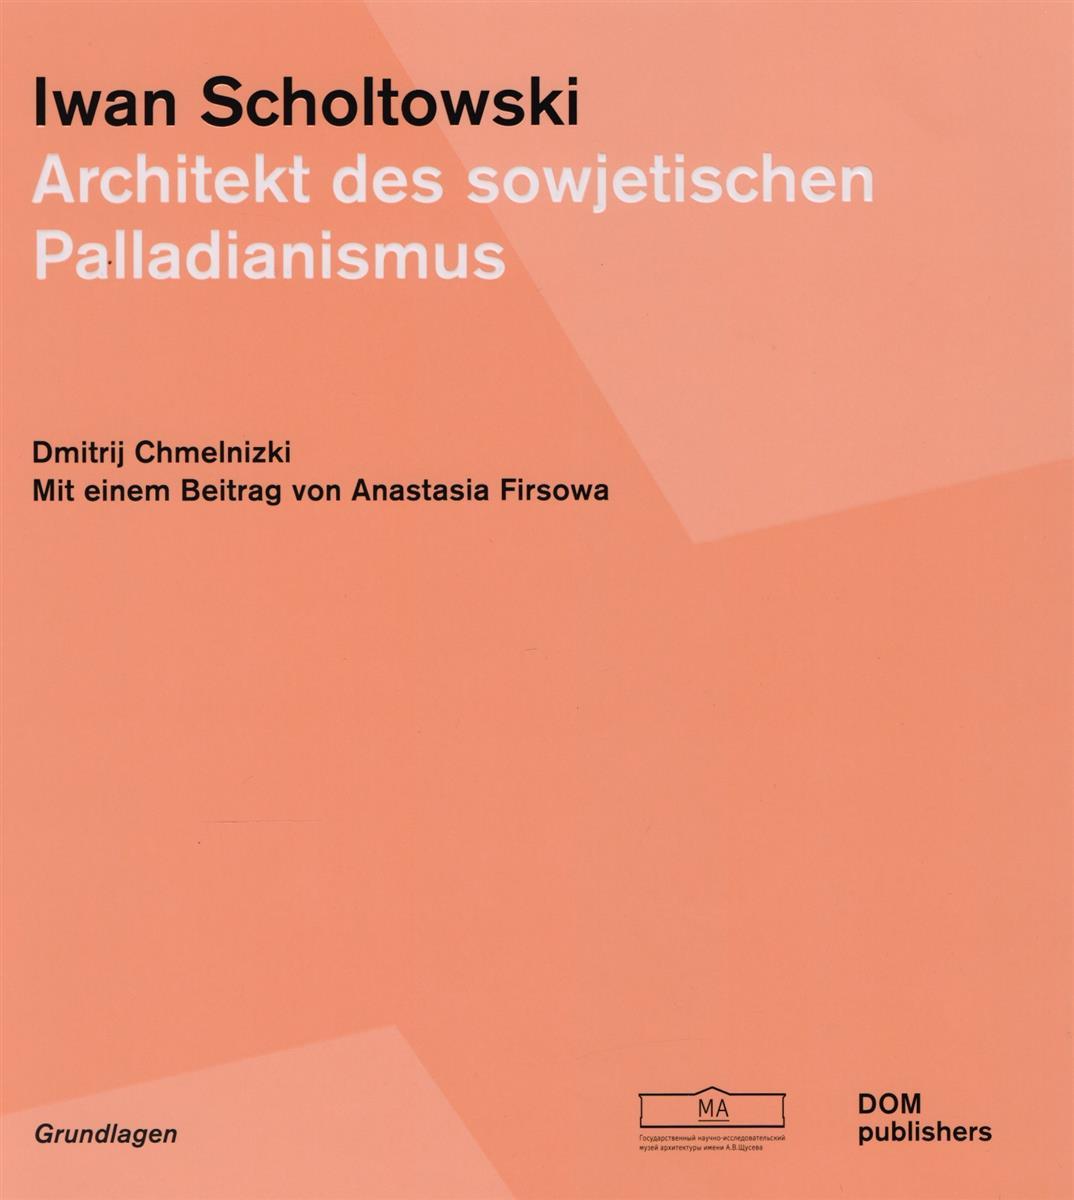 Iwan Scholtowski. Architekt des sowjetischen Palladianismus = Иван Жолтовский. Архитектор советского палладинства от Читай-город